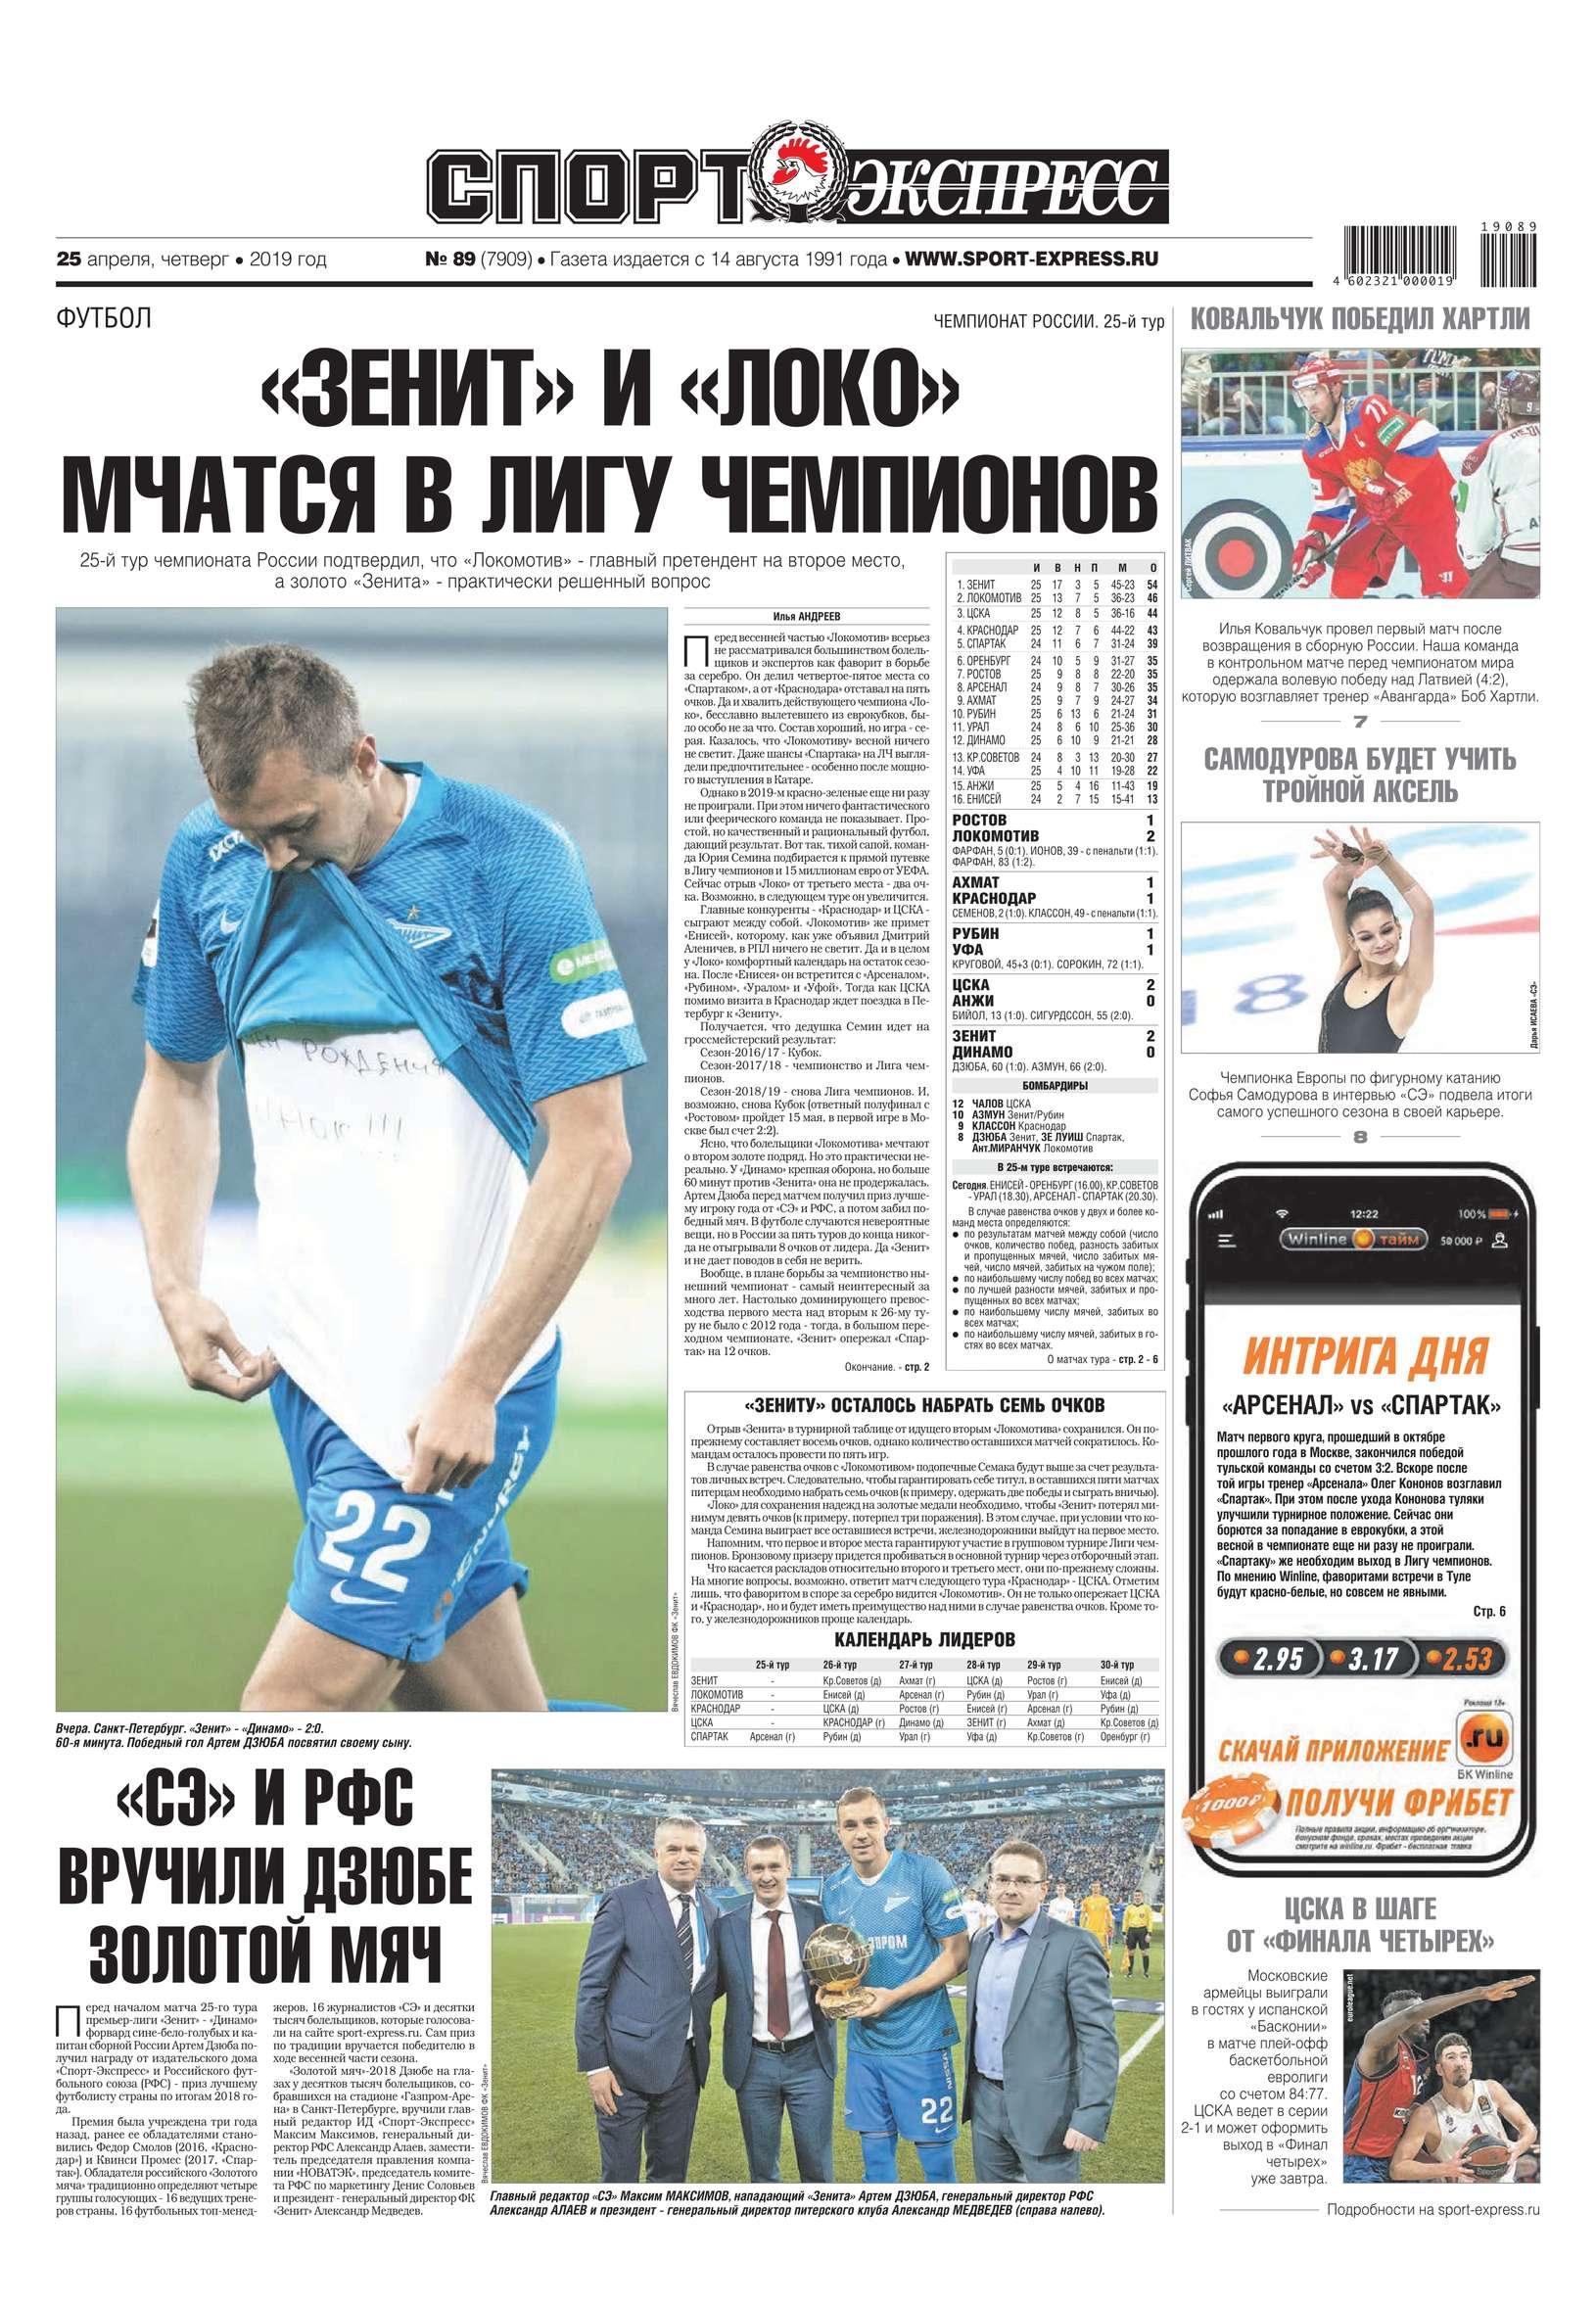 Редакция газеты Спорт-экспресс Спорт-экспресс 89-2019 цена